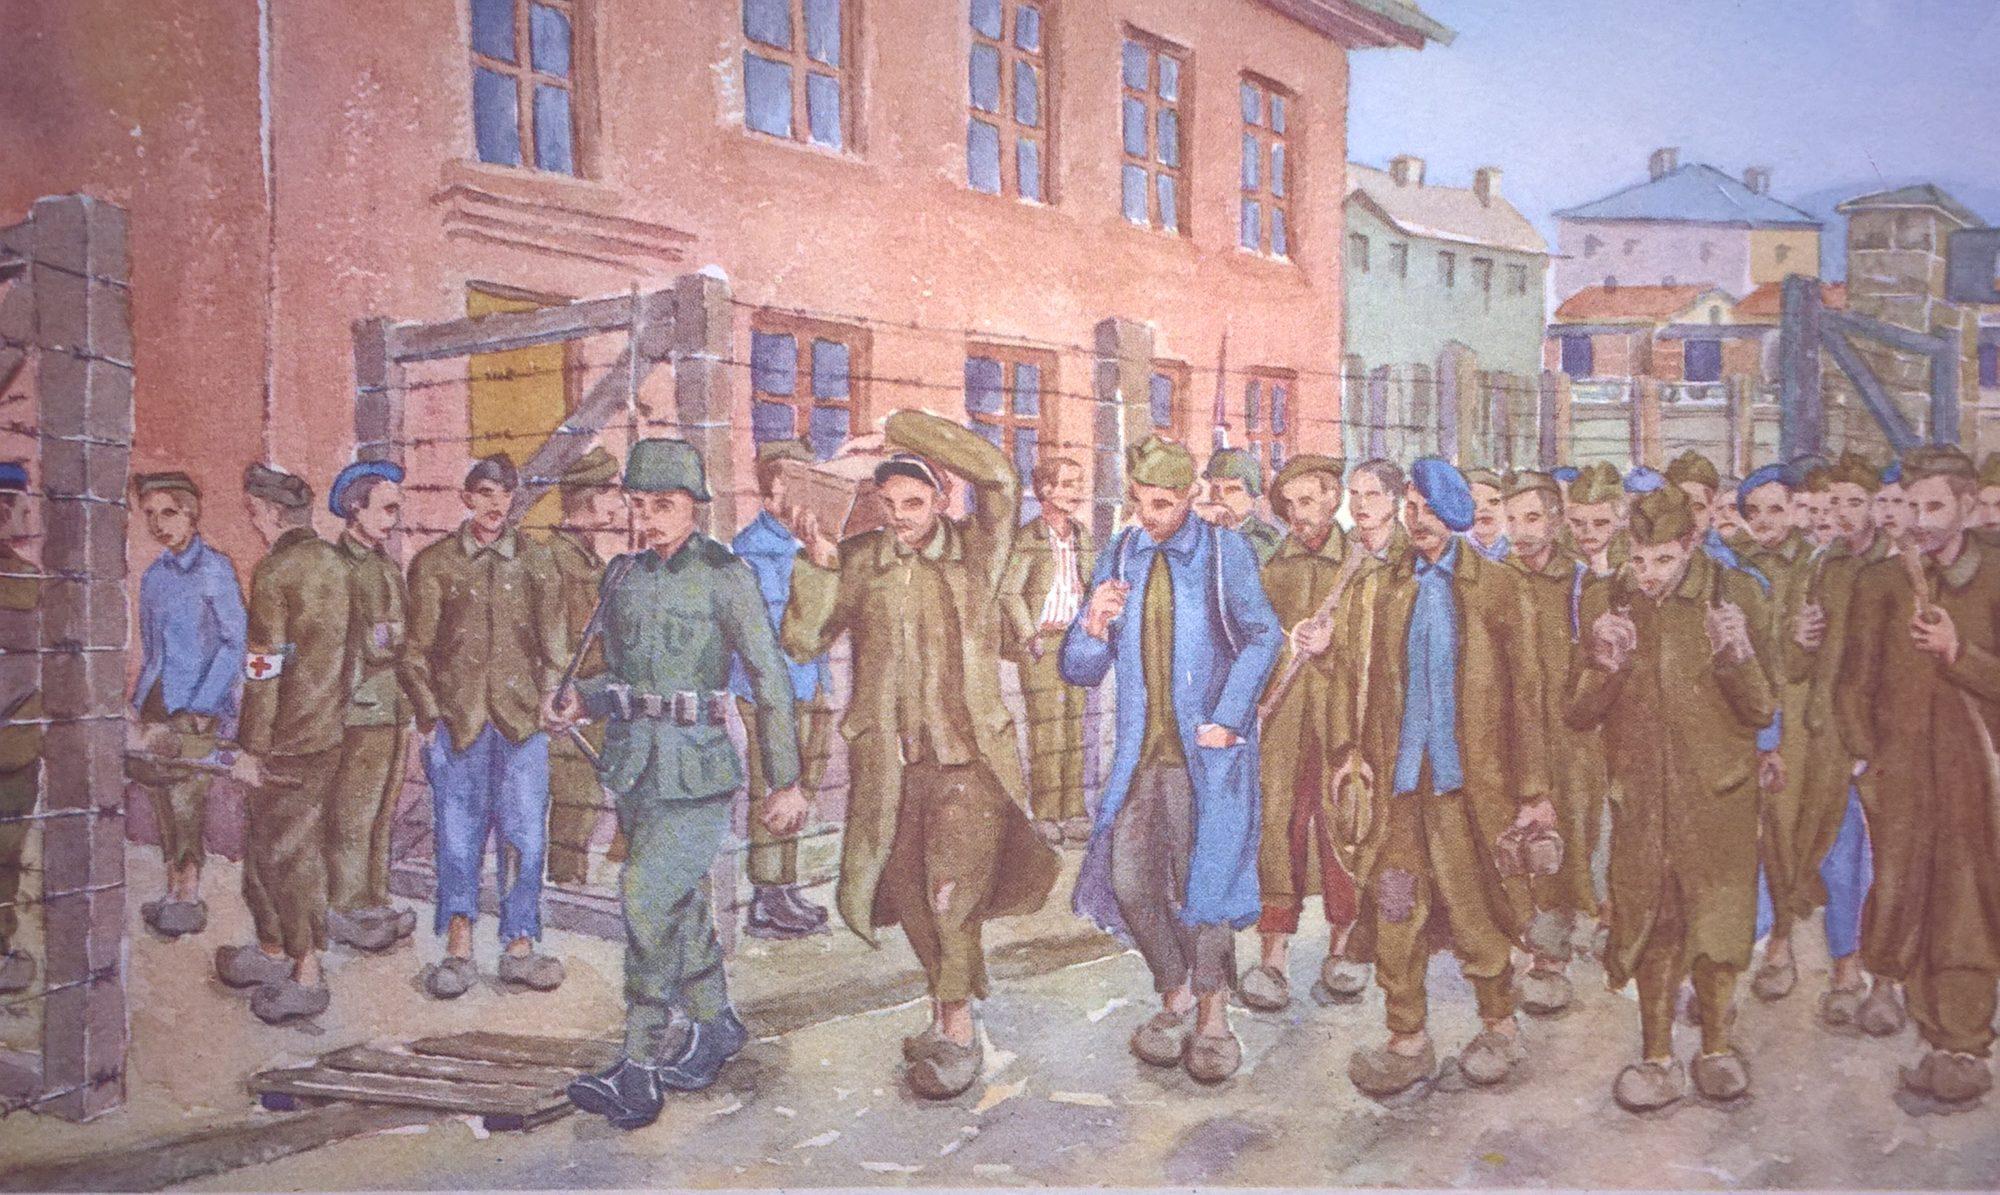 Ceux de Rawa Ruska et leurs descendants